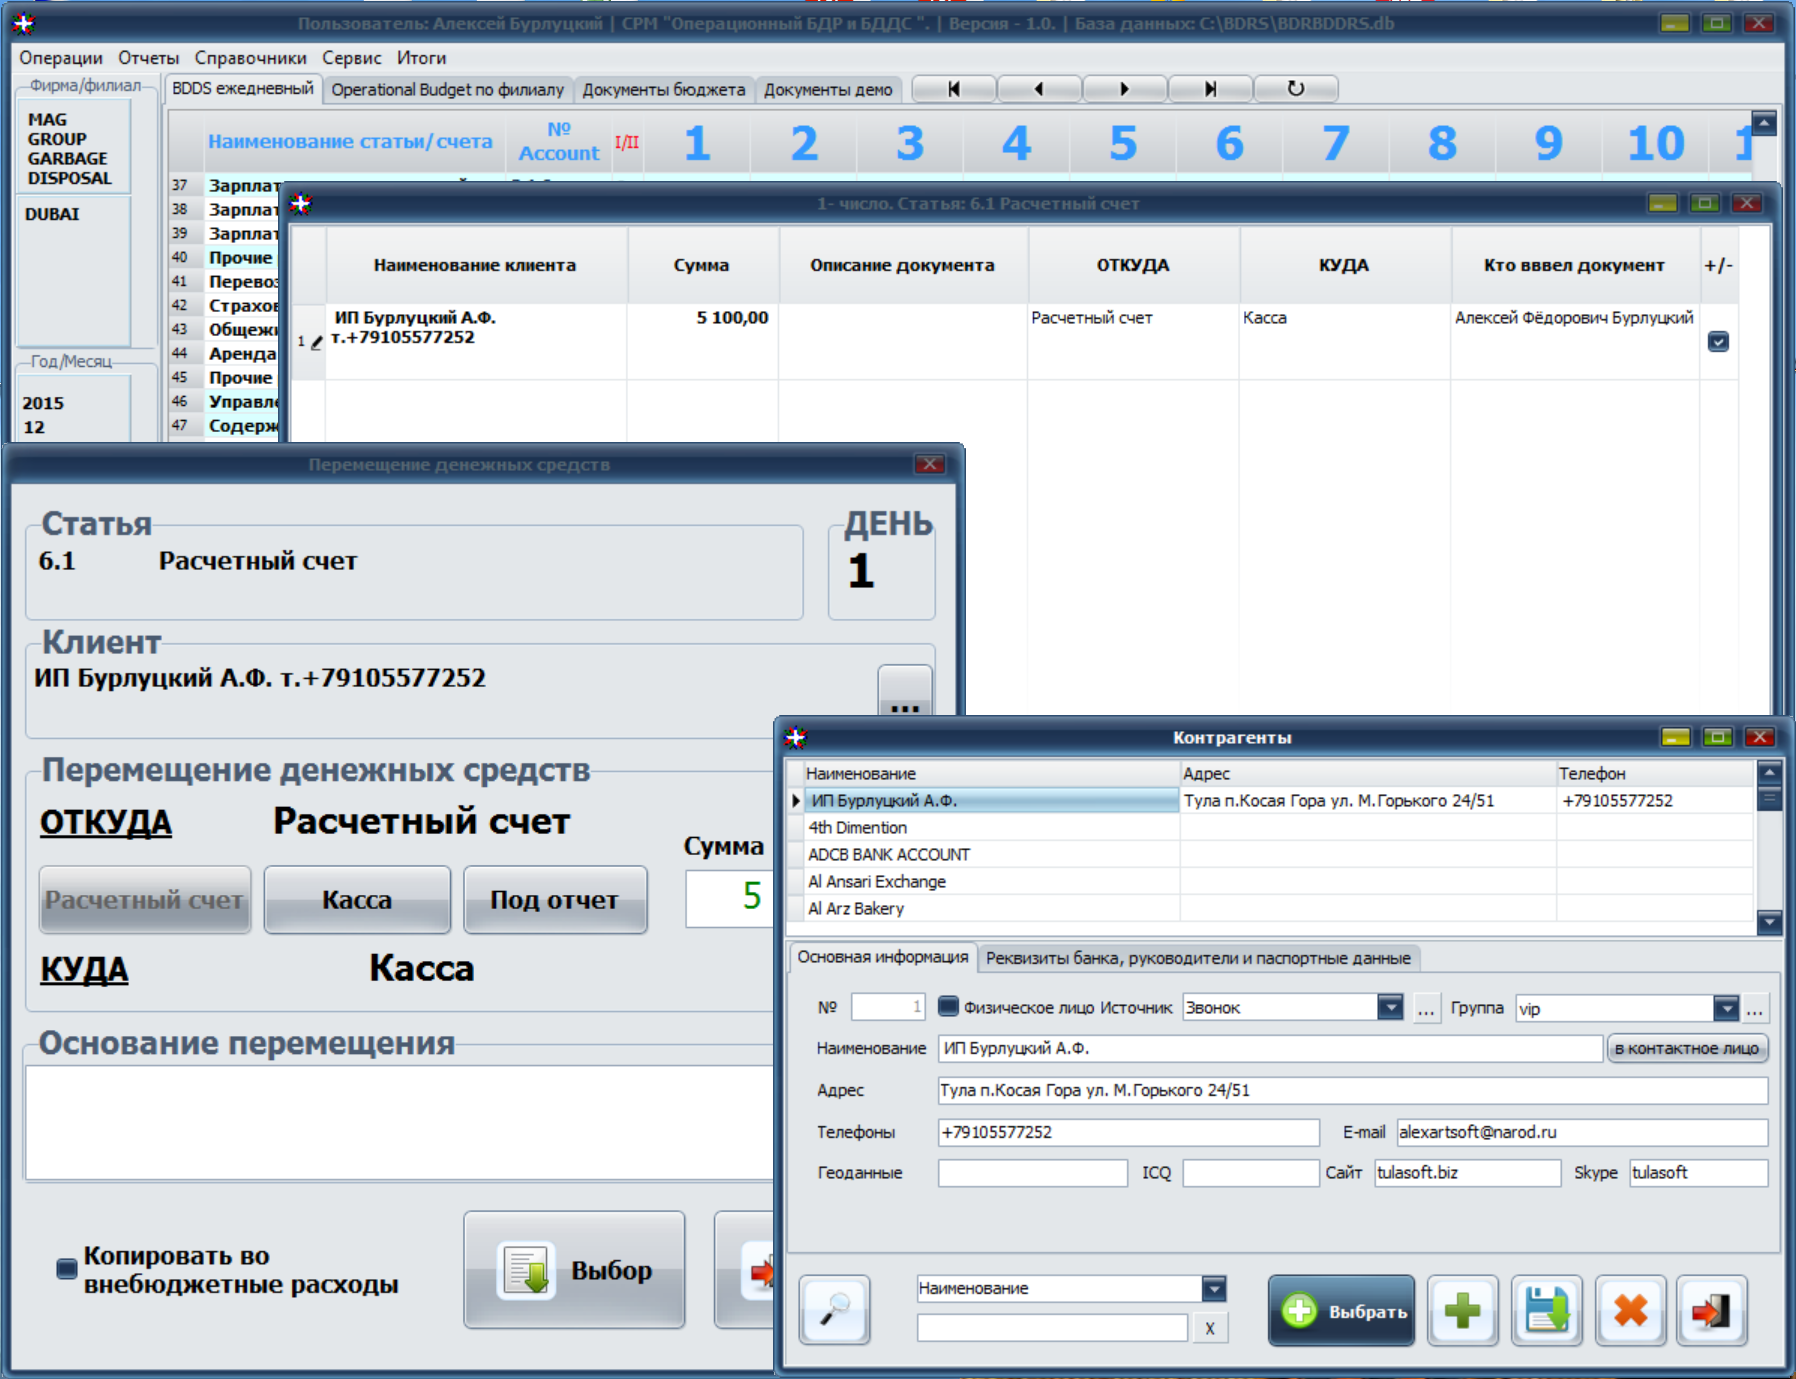 Корпоративная система оперативного учета на предприятии для БДР и БДДРС в зонах офшора